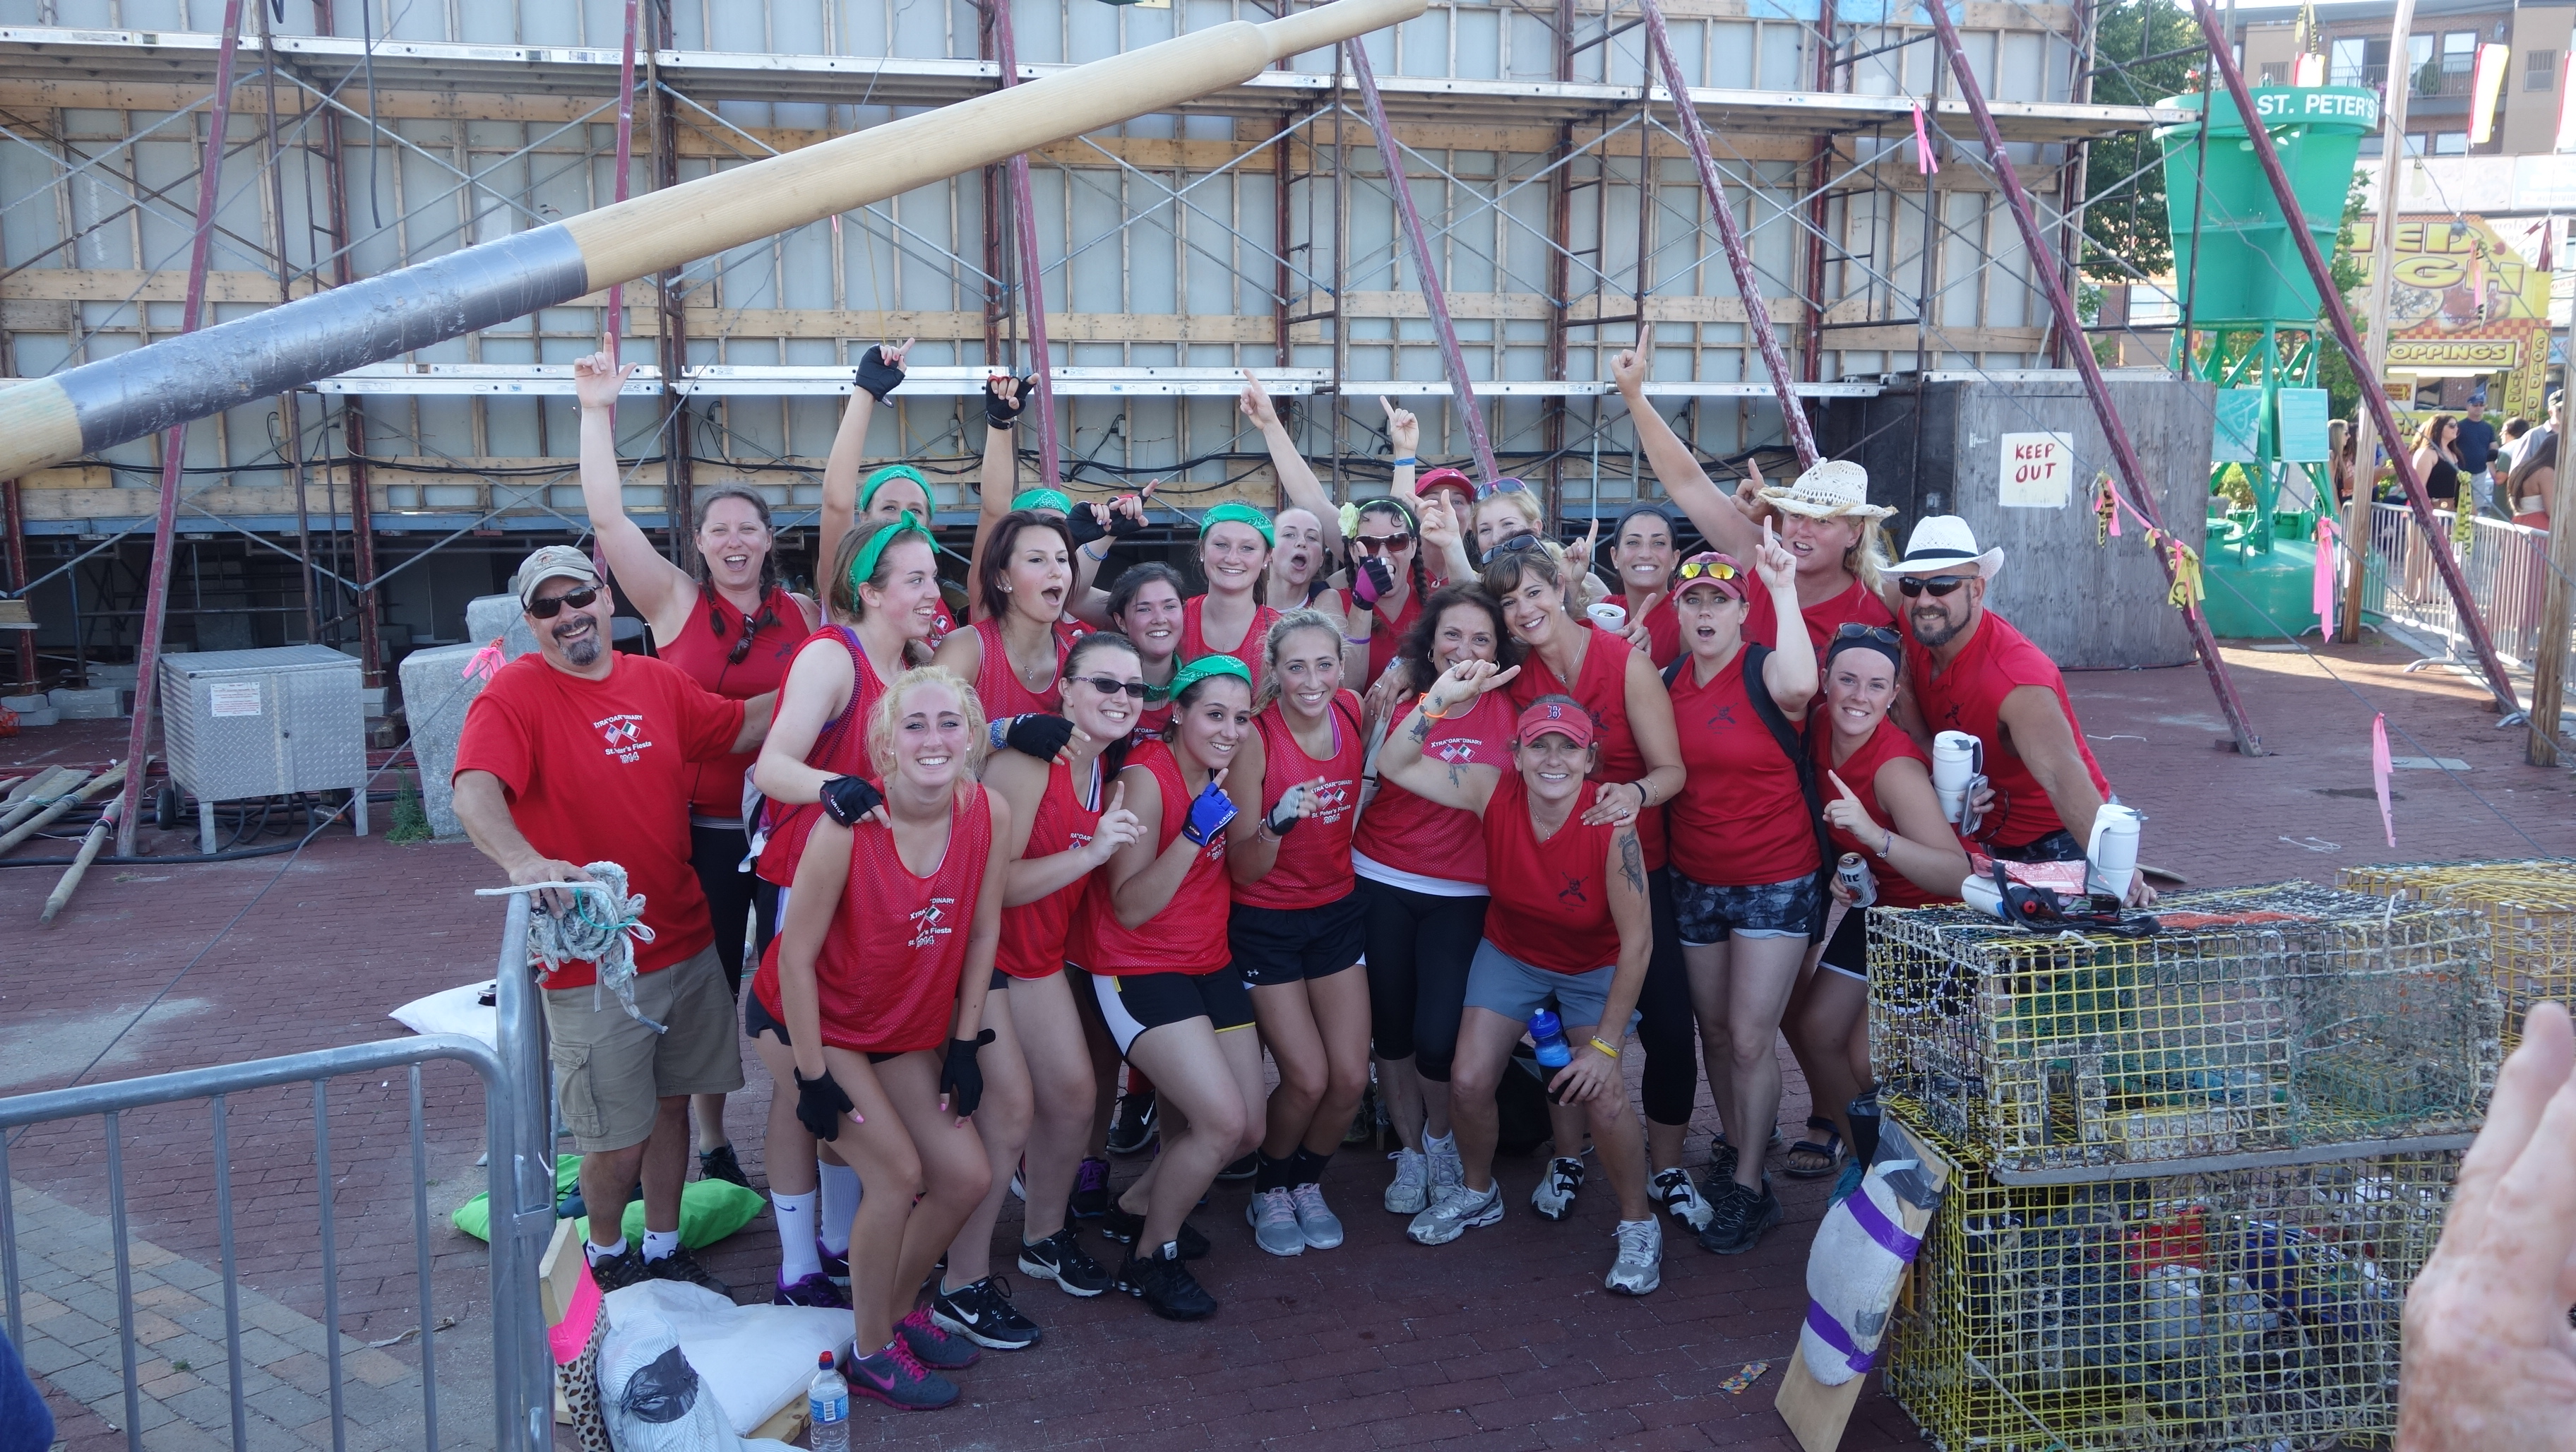 Amanda Race St. Peter's Fiesta 2014 Camps! 338